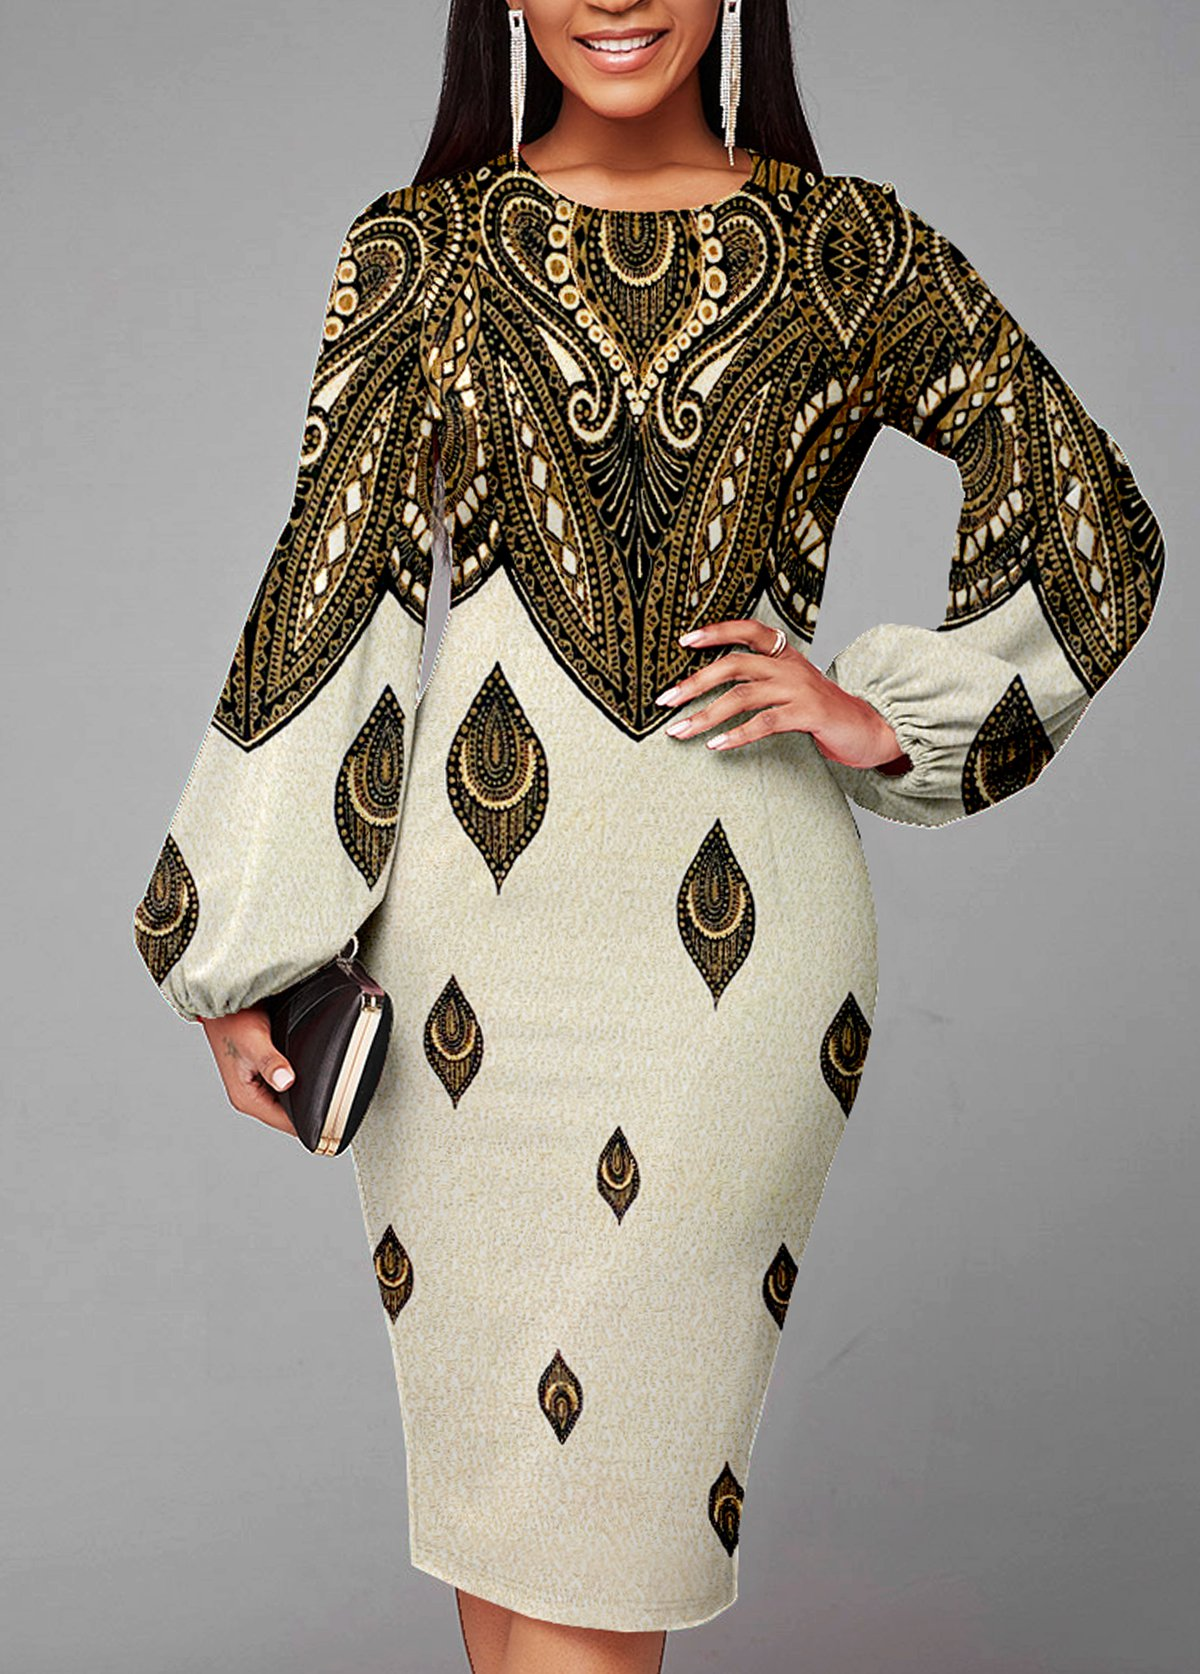 ROTITA Foil Print Lantern Sleeve Texture Knitted Dress